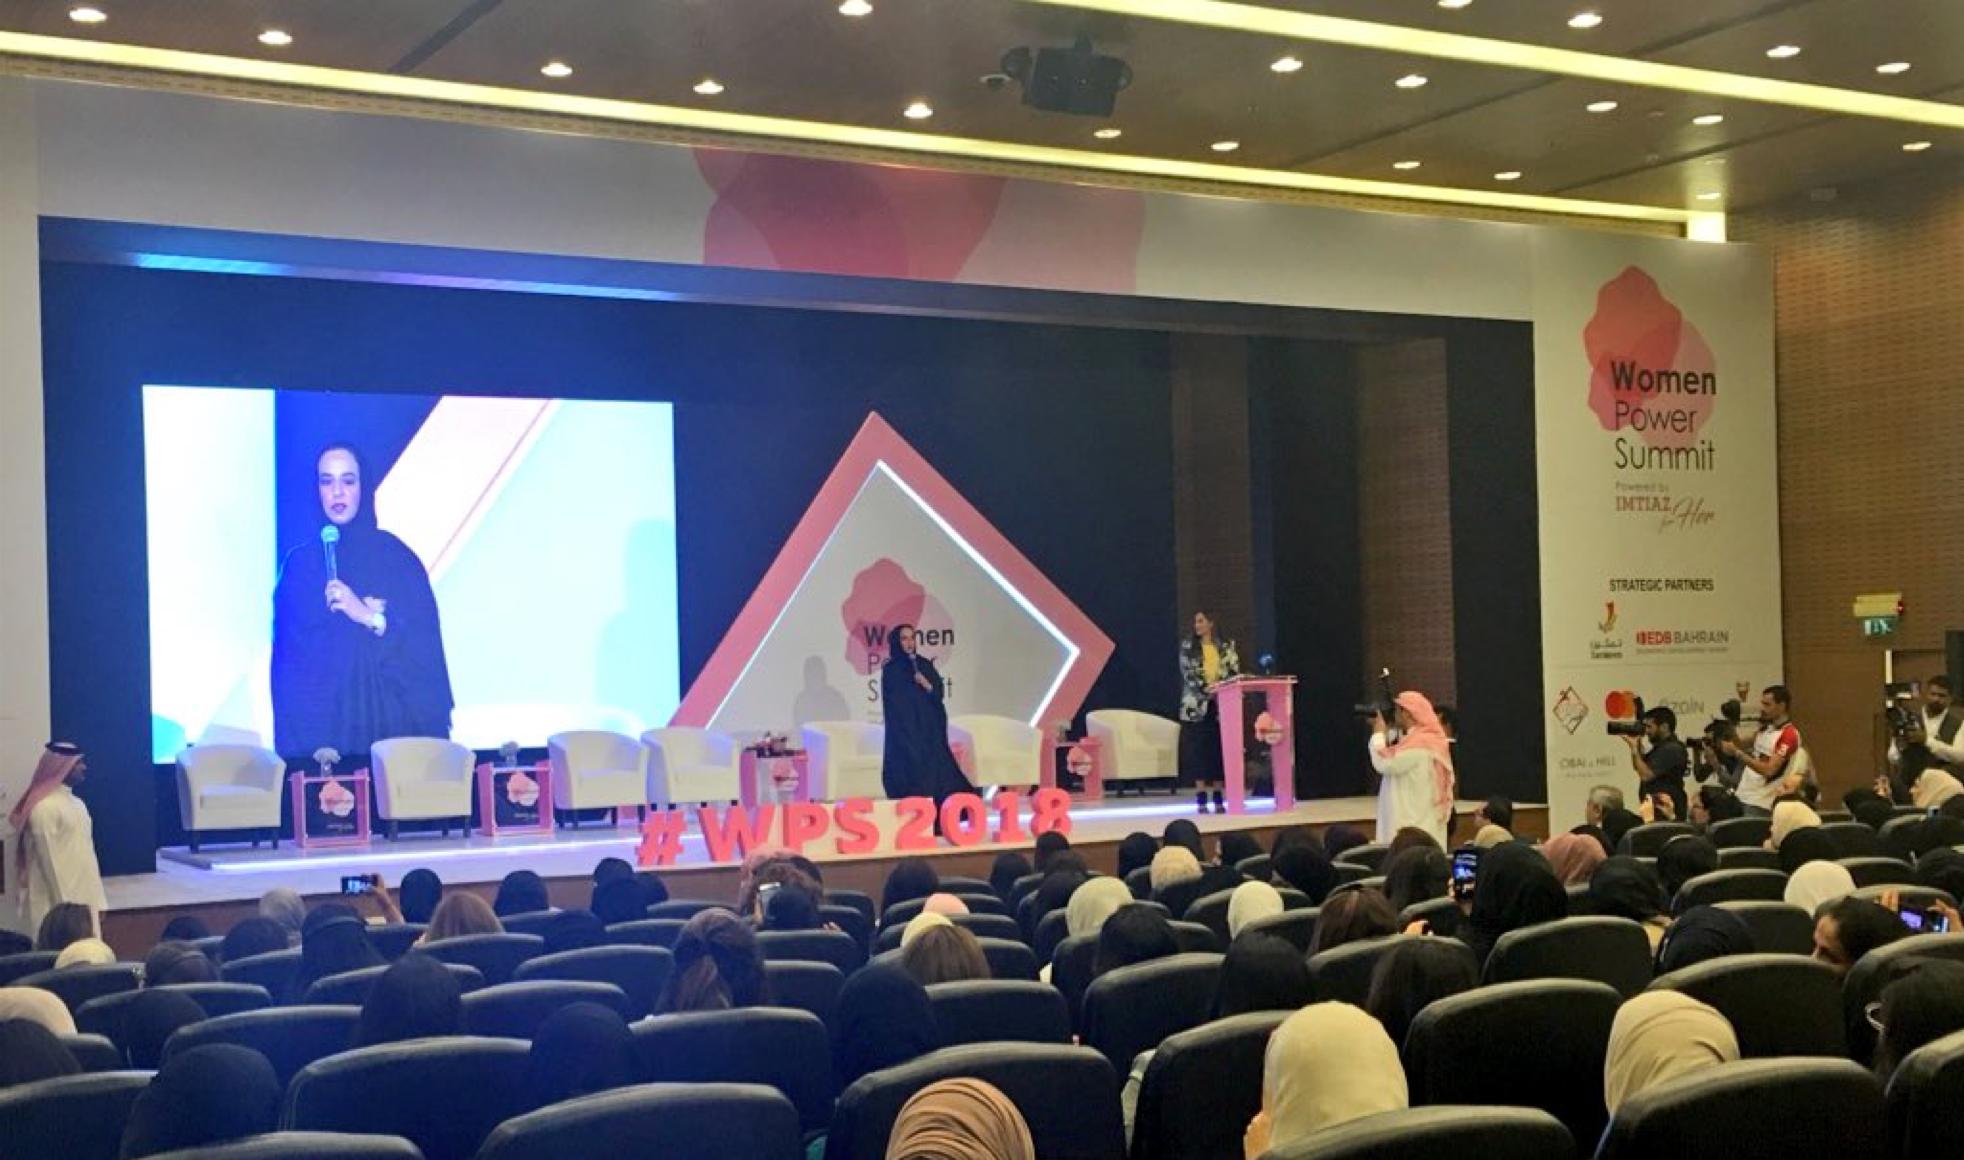 Image caption: Her Highness Sheikha Hessa Bint Khalifa Al Khalifa during Women Power Summit